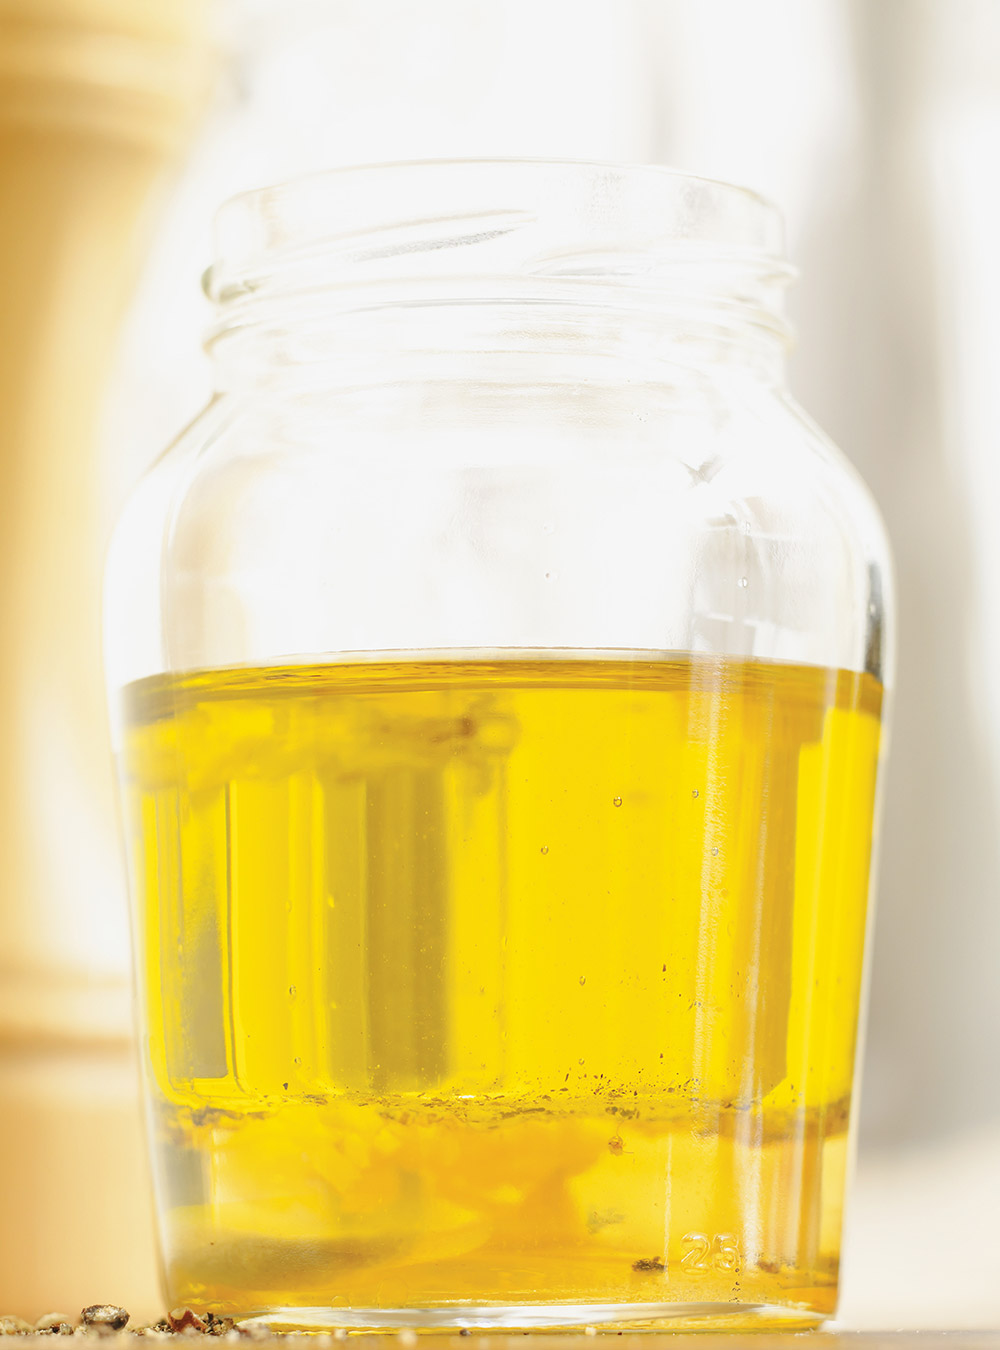 Marinade margarita | ricardo